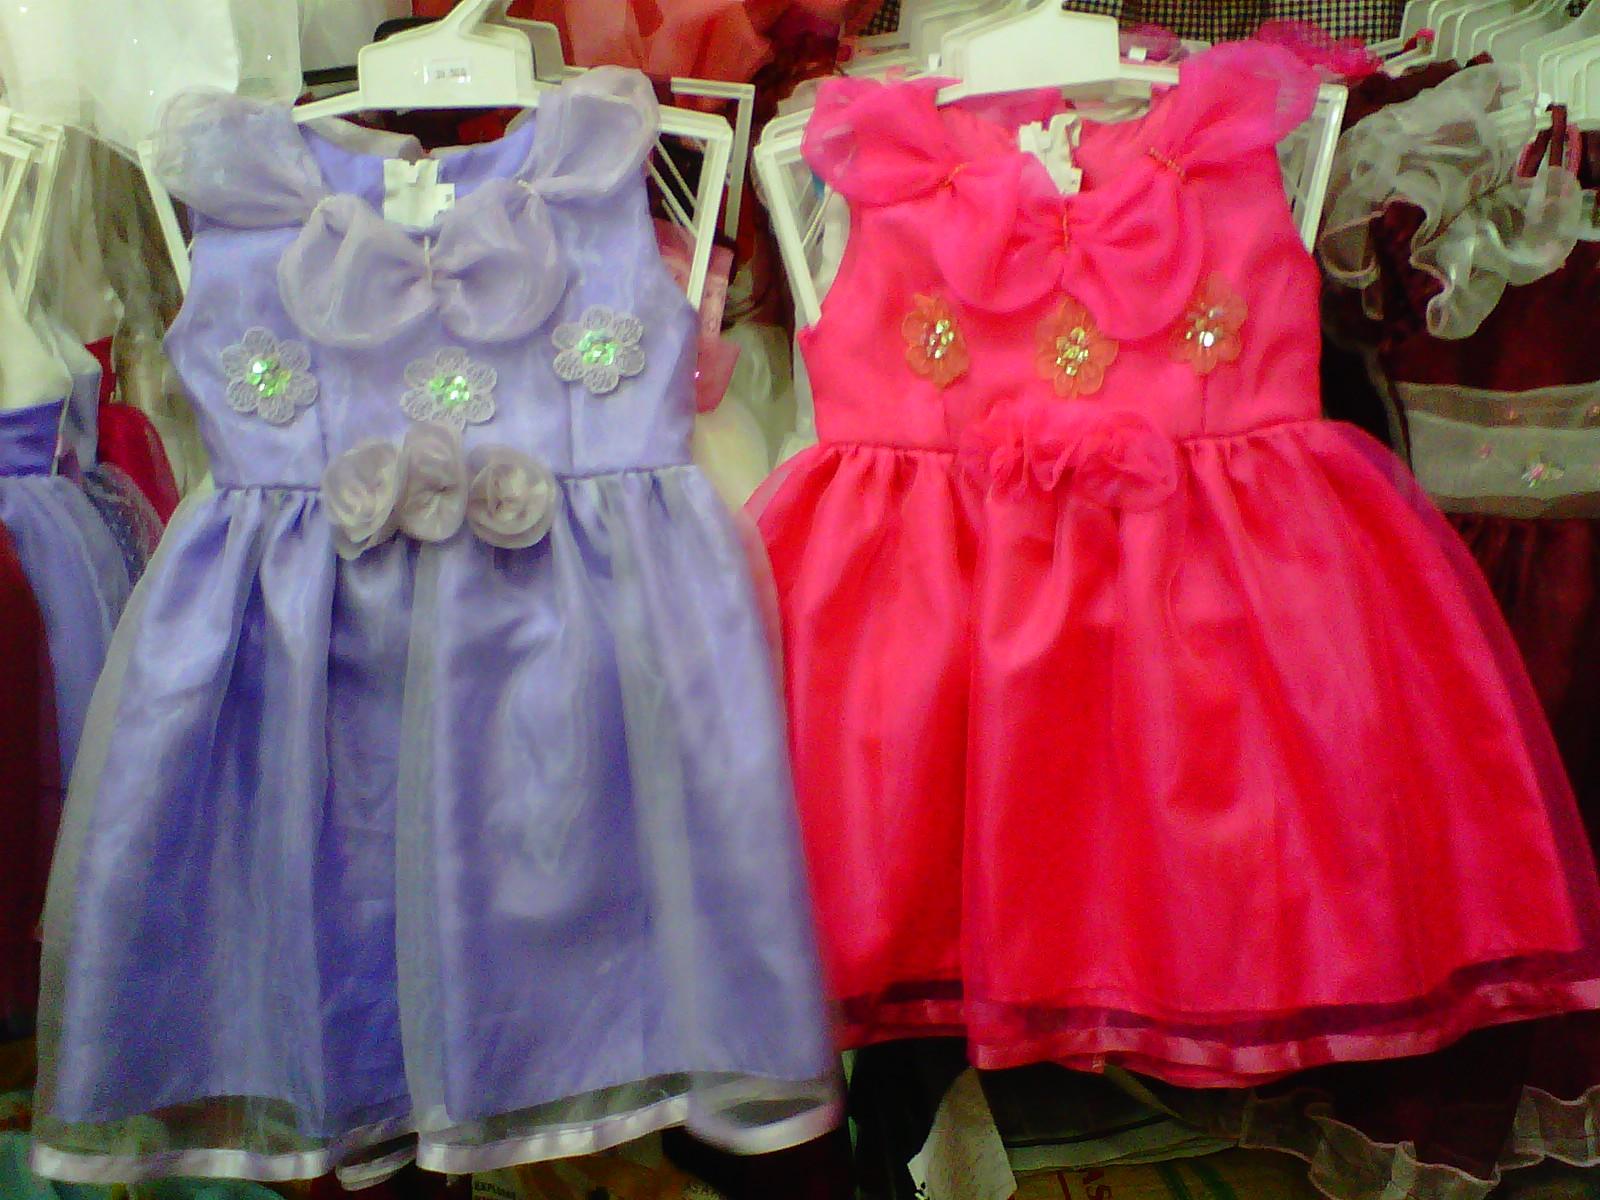 Jual Baju Pesta Anak Perempuan Grosir Baju Pesta Anak